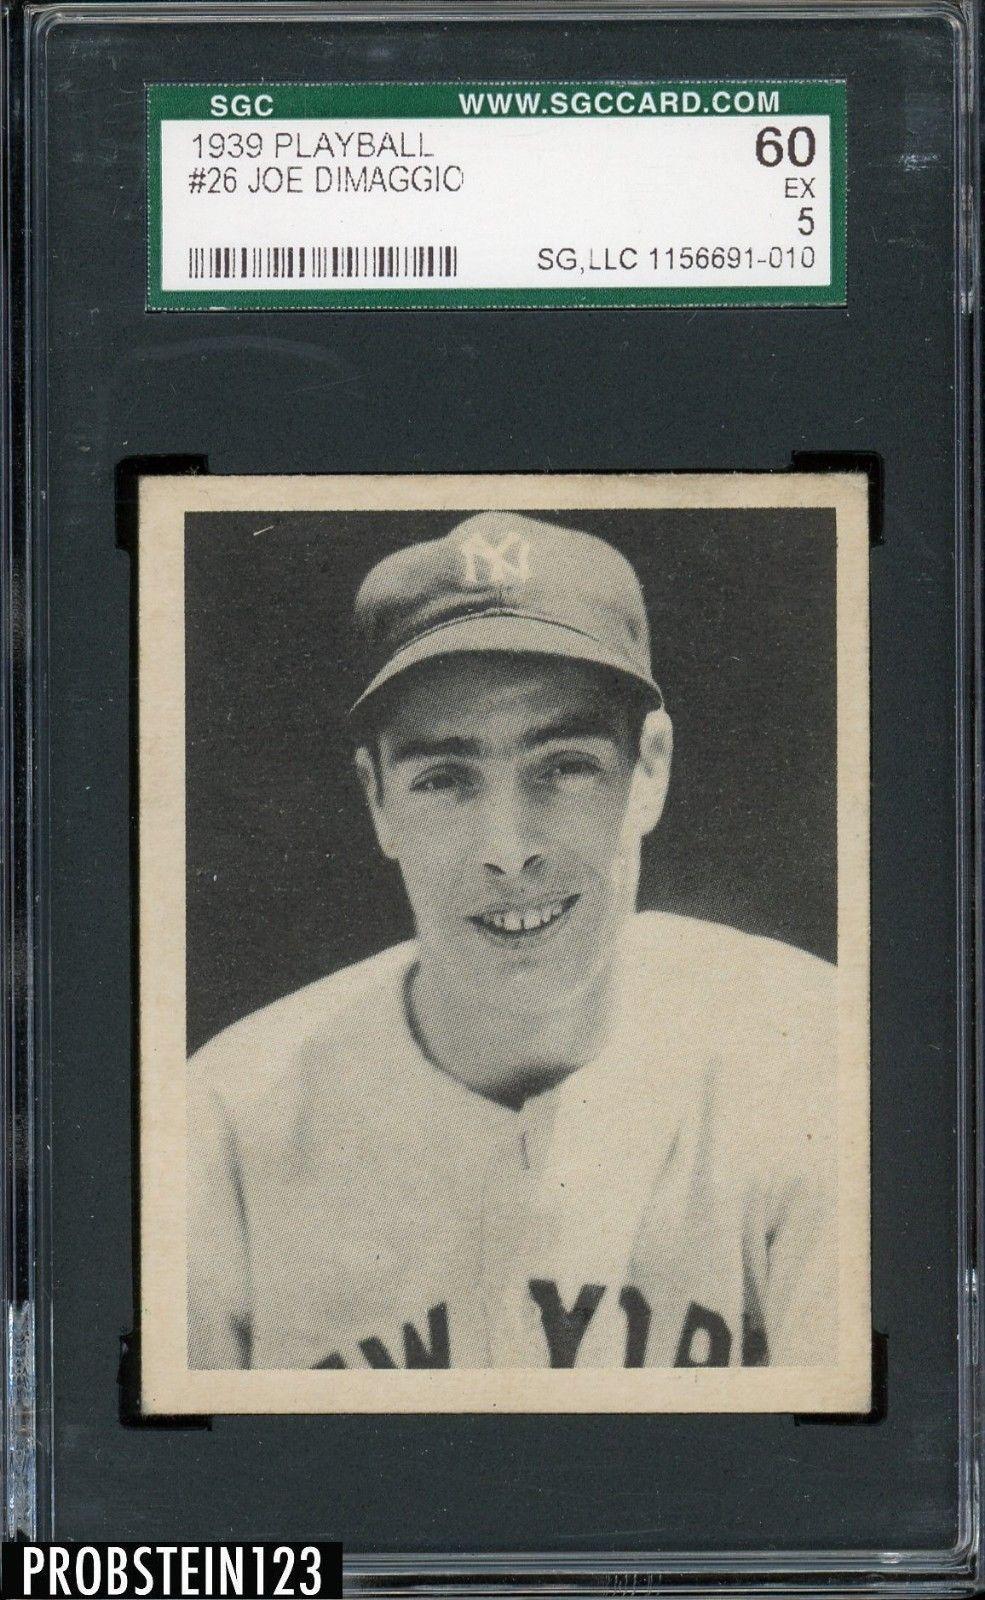 1939 Play Ball 26 Joe Dimaggio New York Yankees Hof Sgc 60 Ex 5